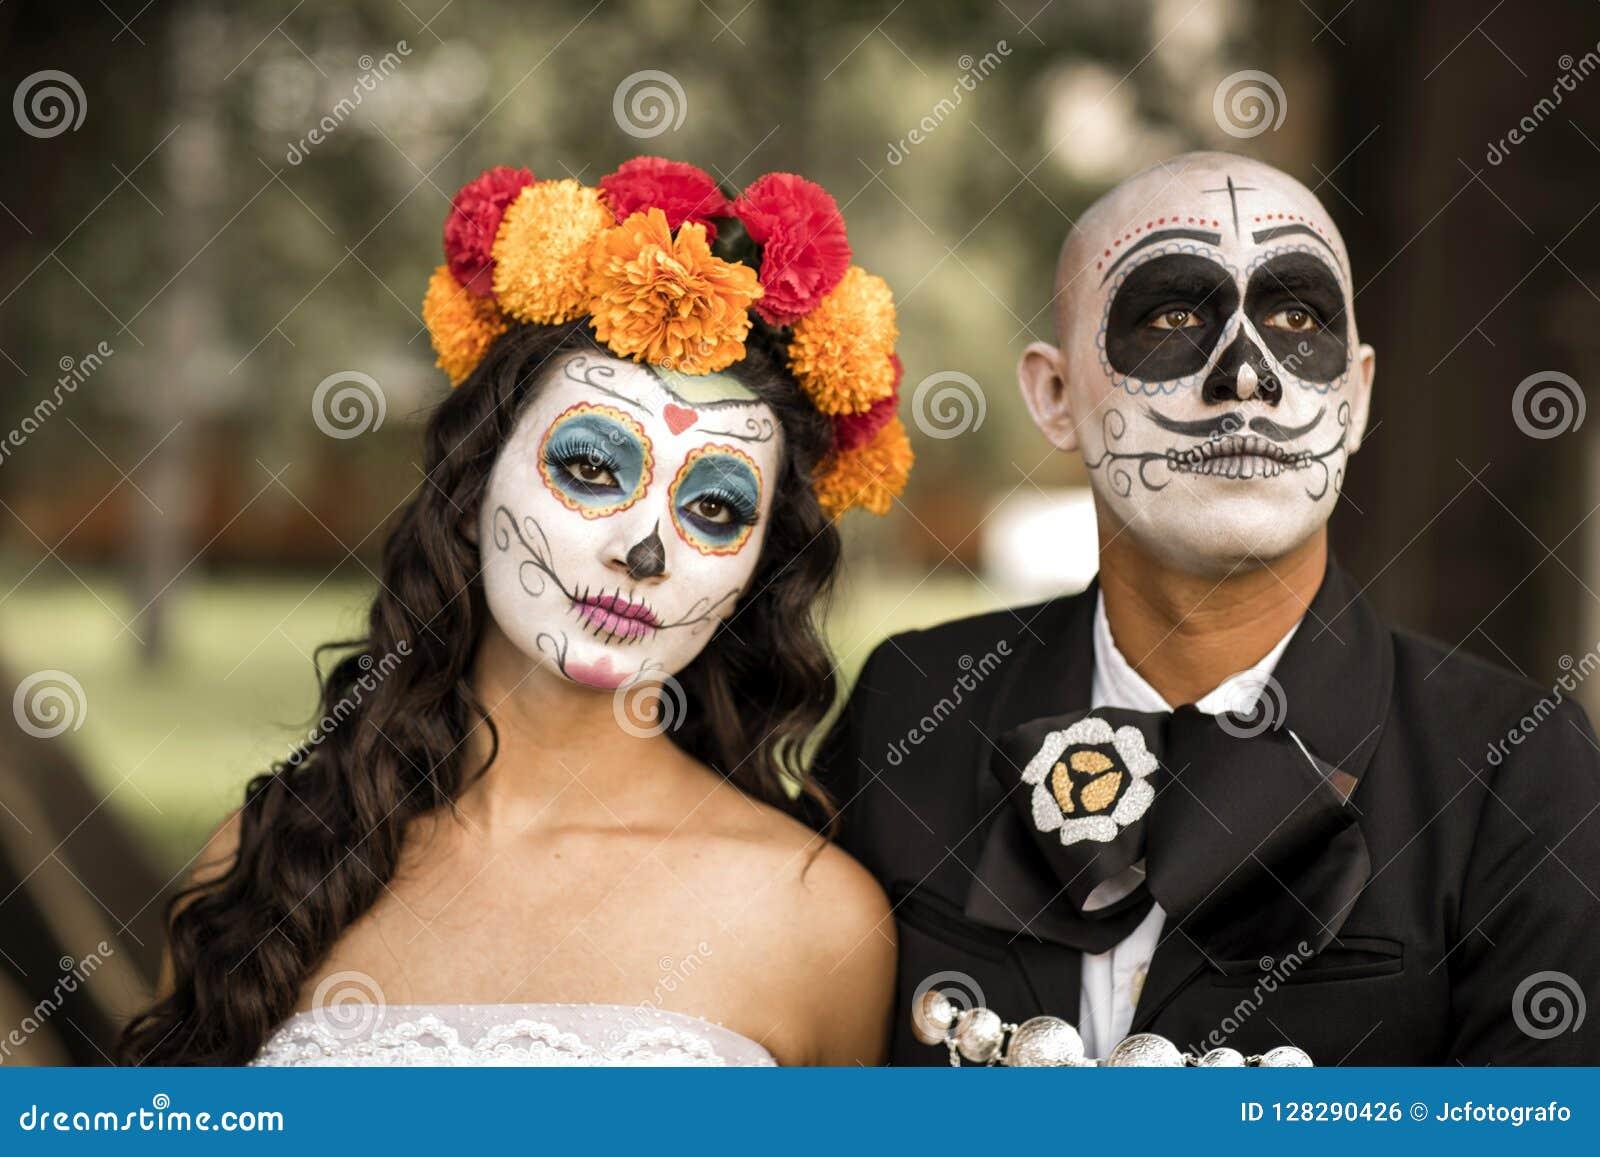 Catrin And Catrina In Cemetery Stock Photo Image Of Guadalajara